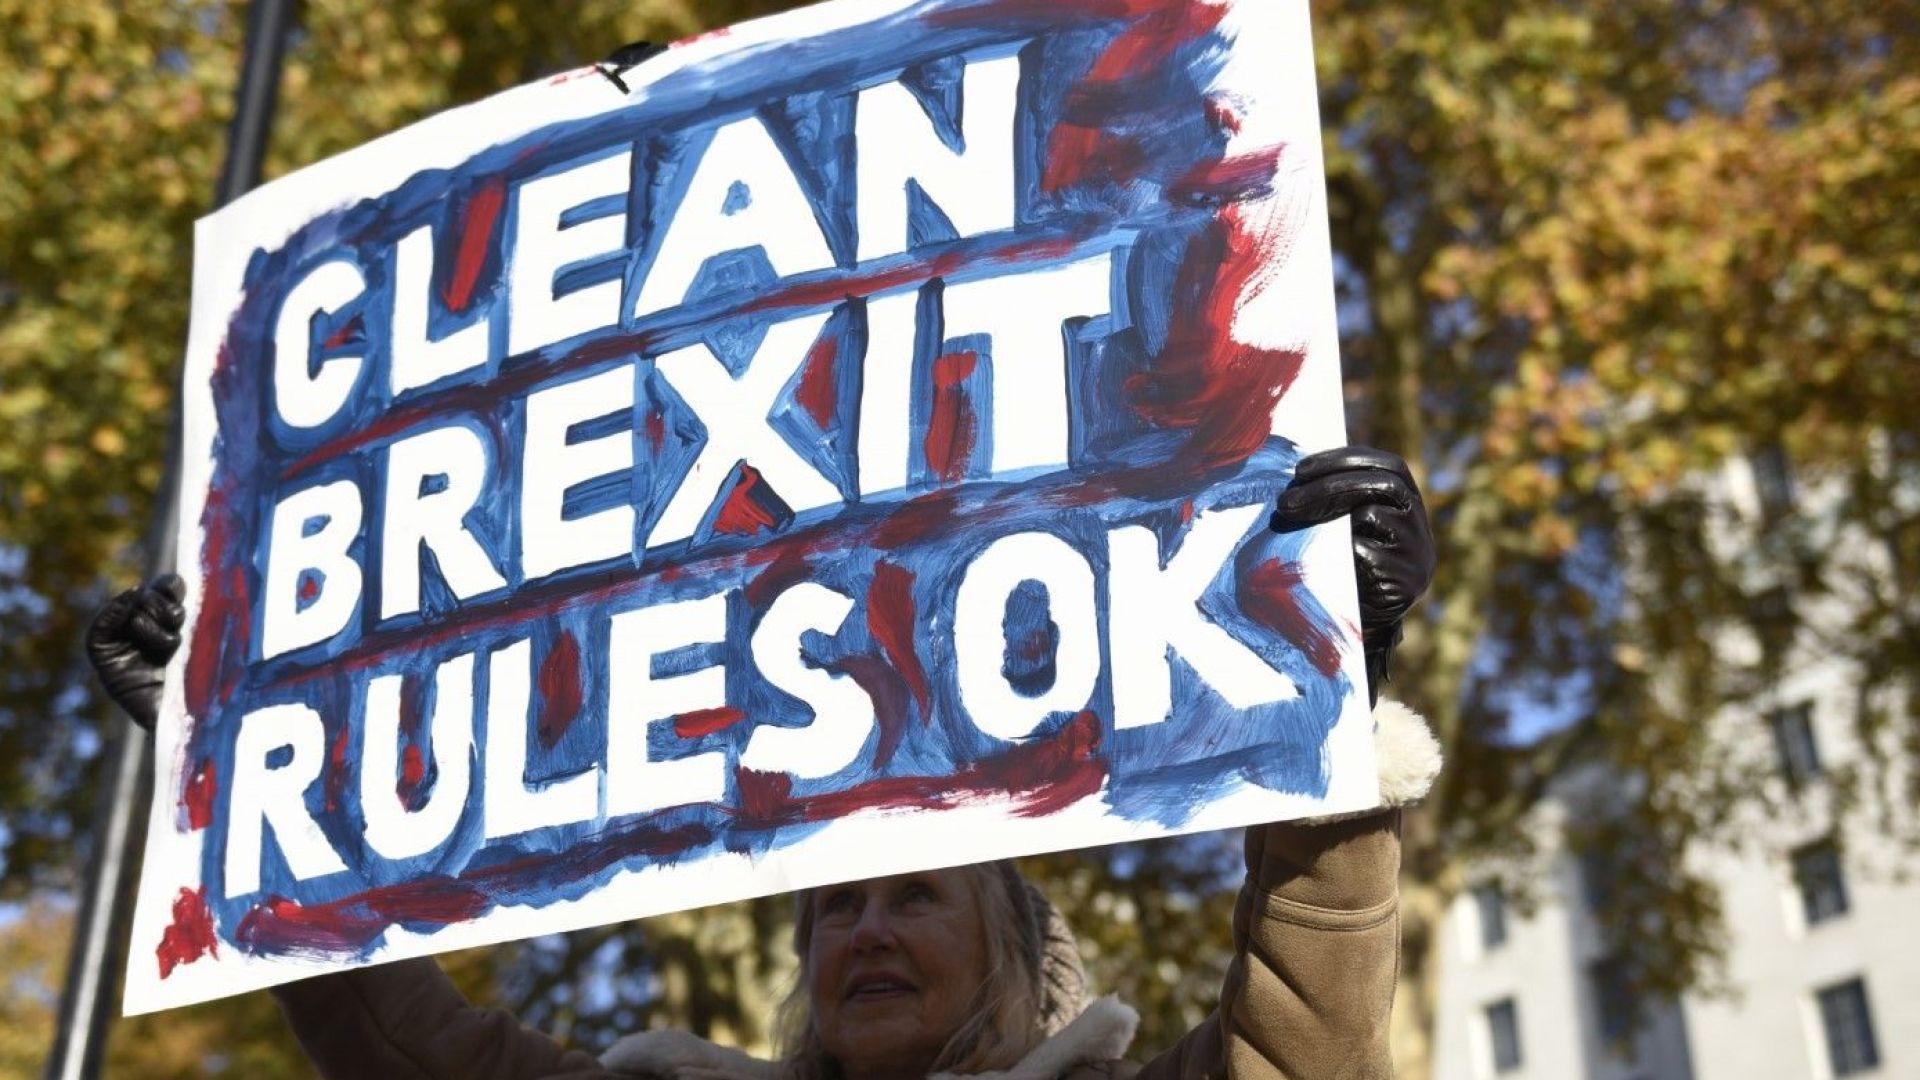 Тереза Мей призна, че нов референдум може да спре Брекзит